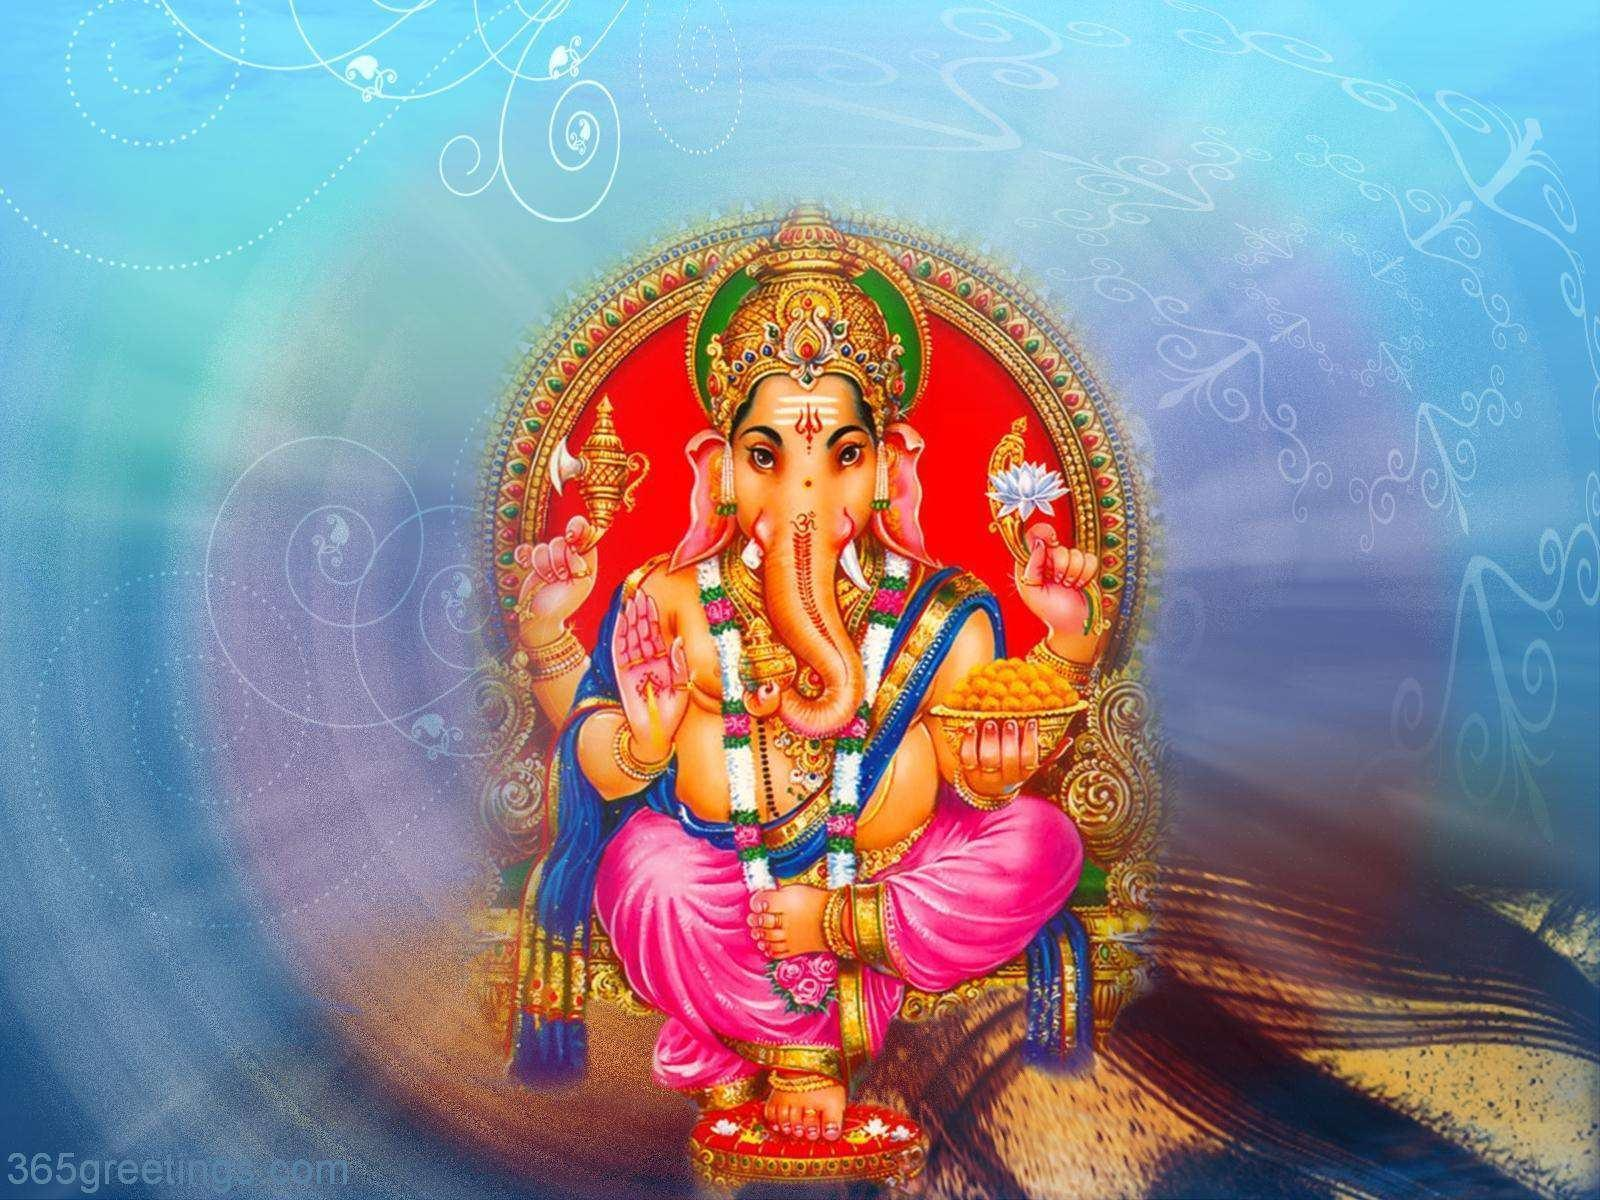 Lord Ganesha Hindu God HD God Images,Wallpapers & Backgrounds hin